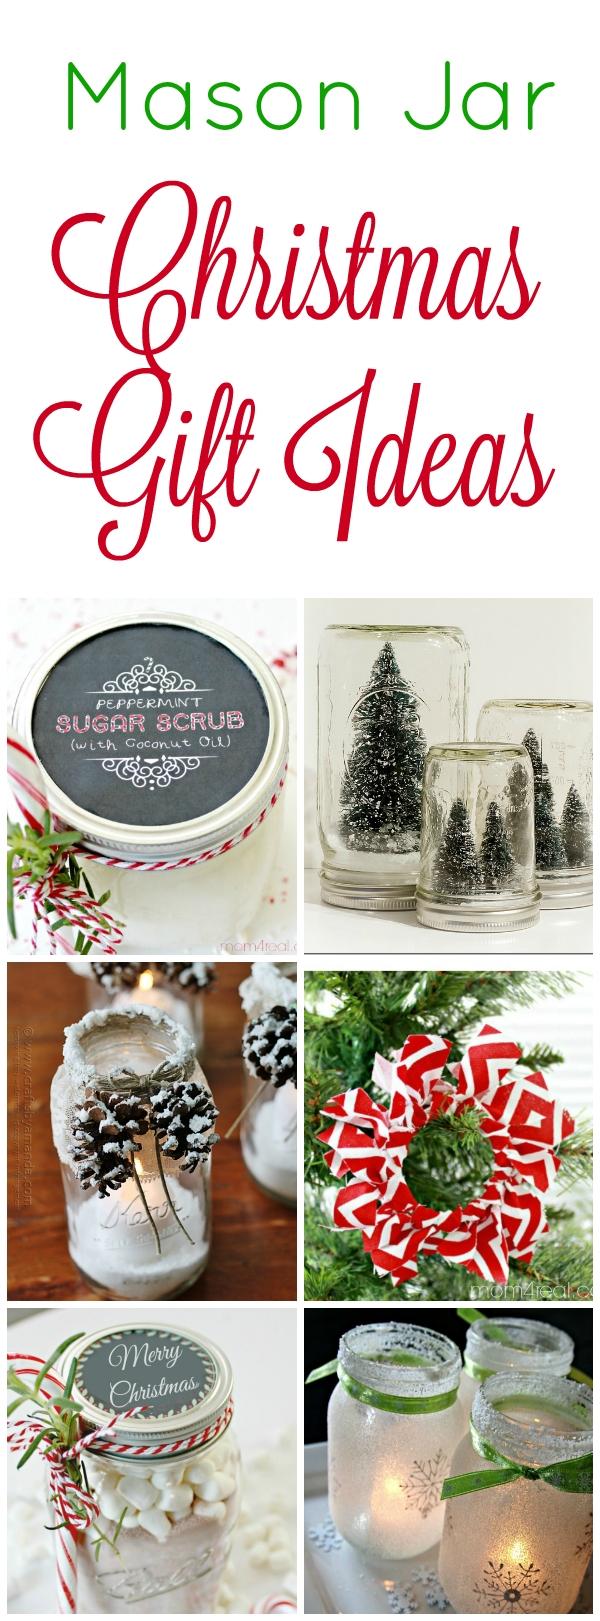 10 Lovable Christmas Gifts For Mom Ideas 14 mason jar christmas gift ideas mom 4 real 3 2020